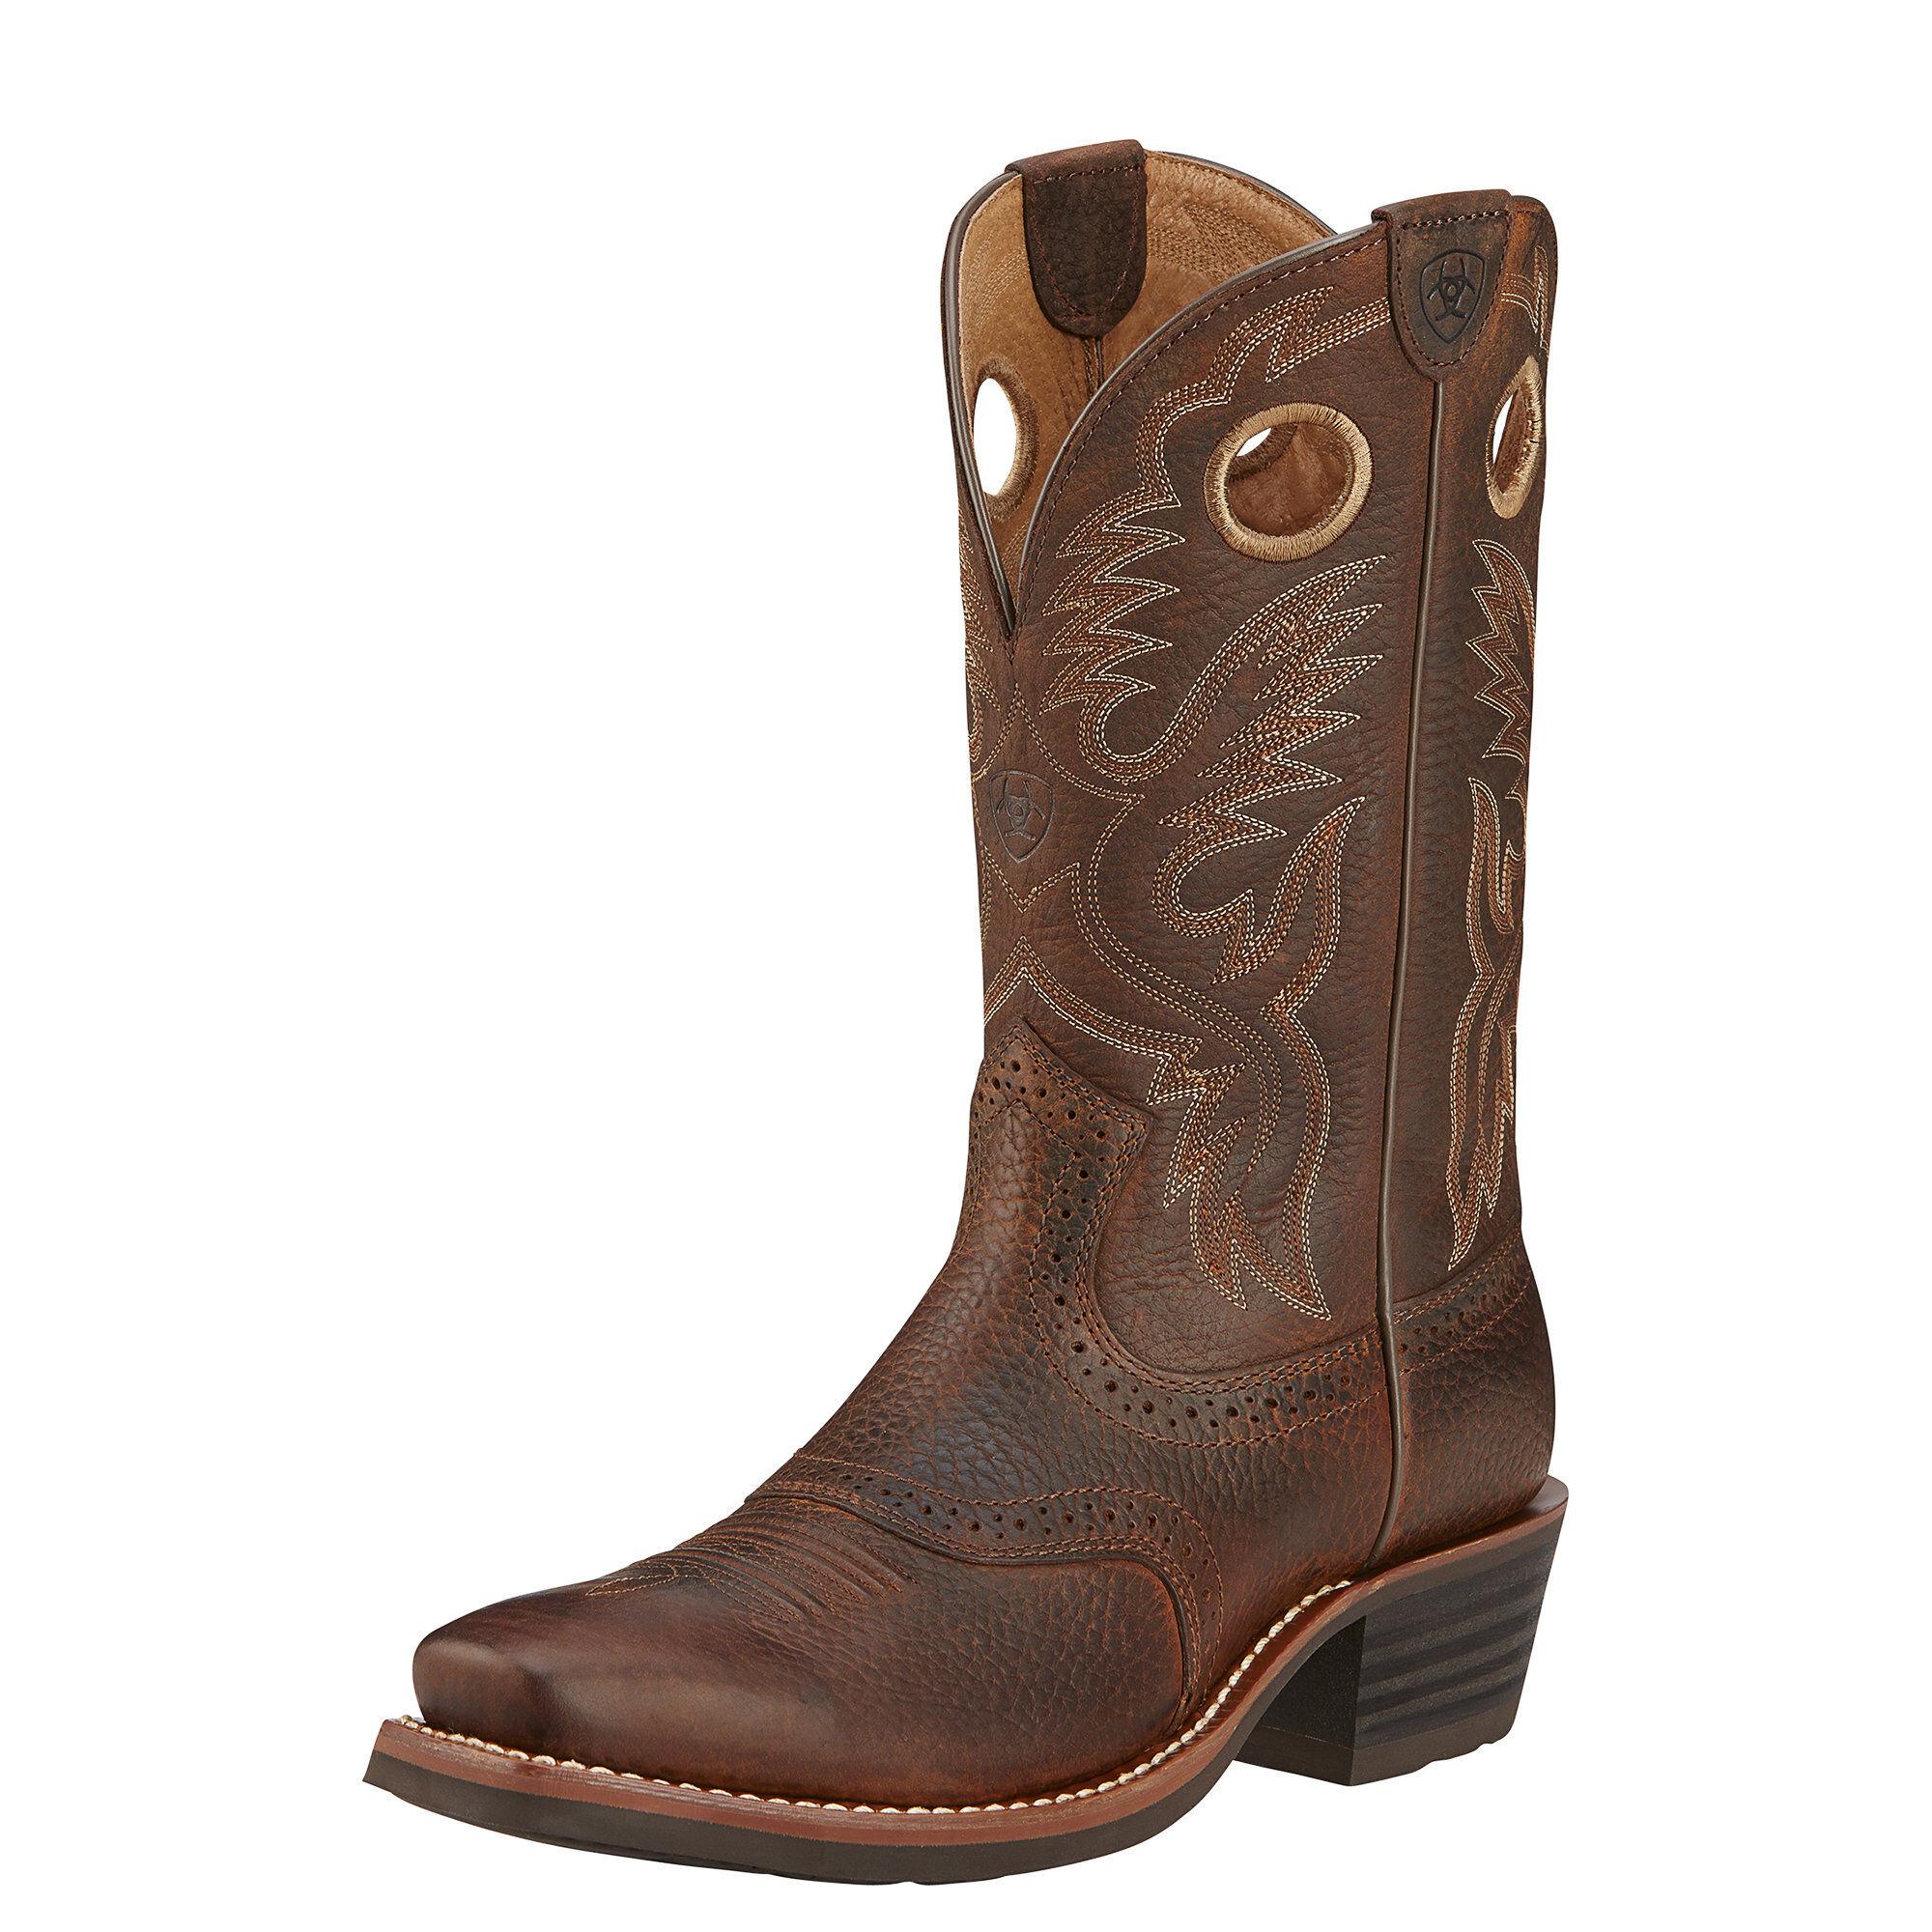 Buy Ariat Boots